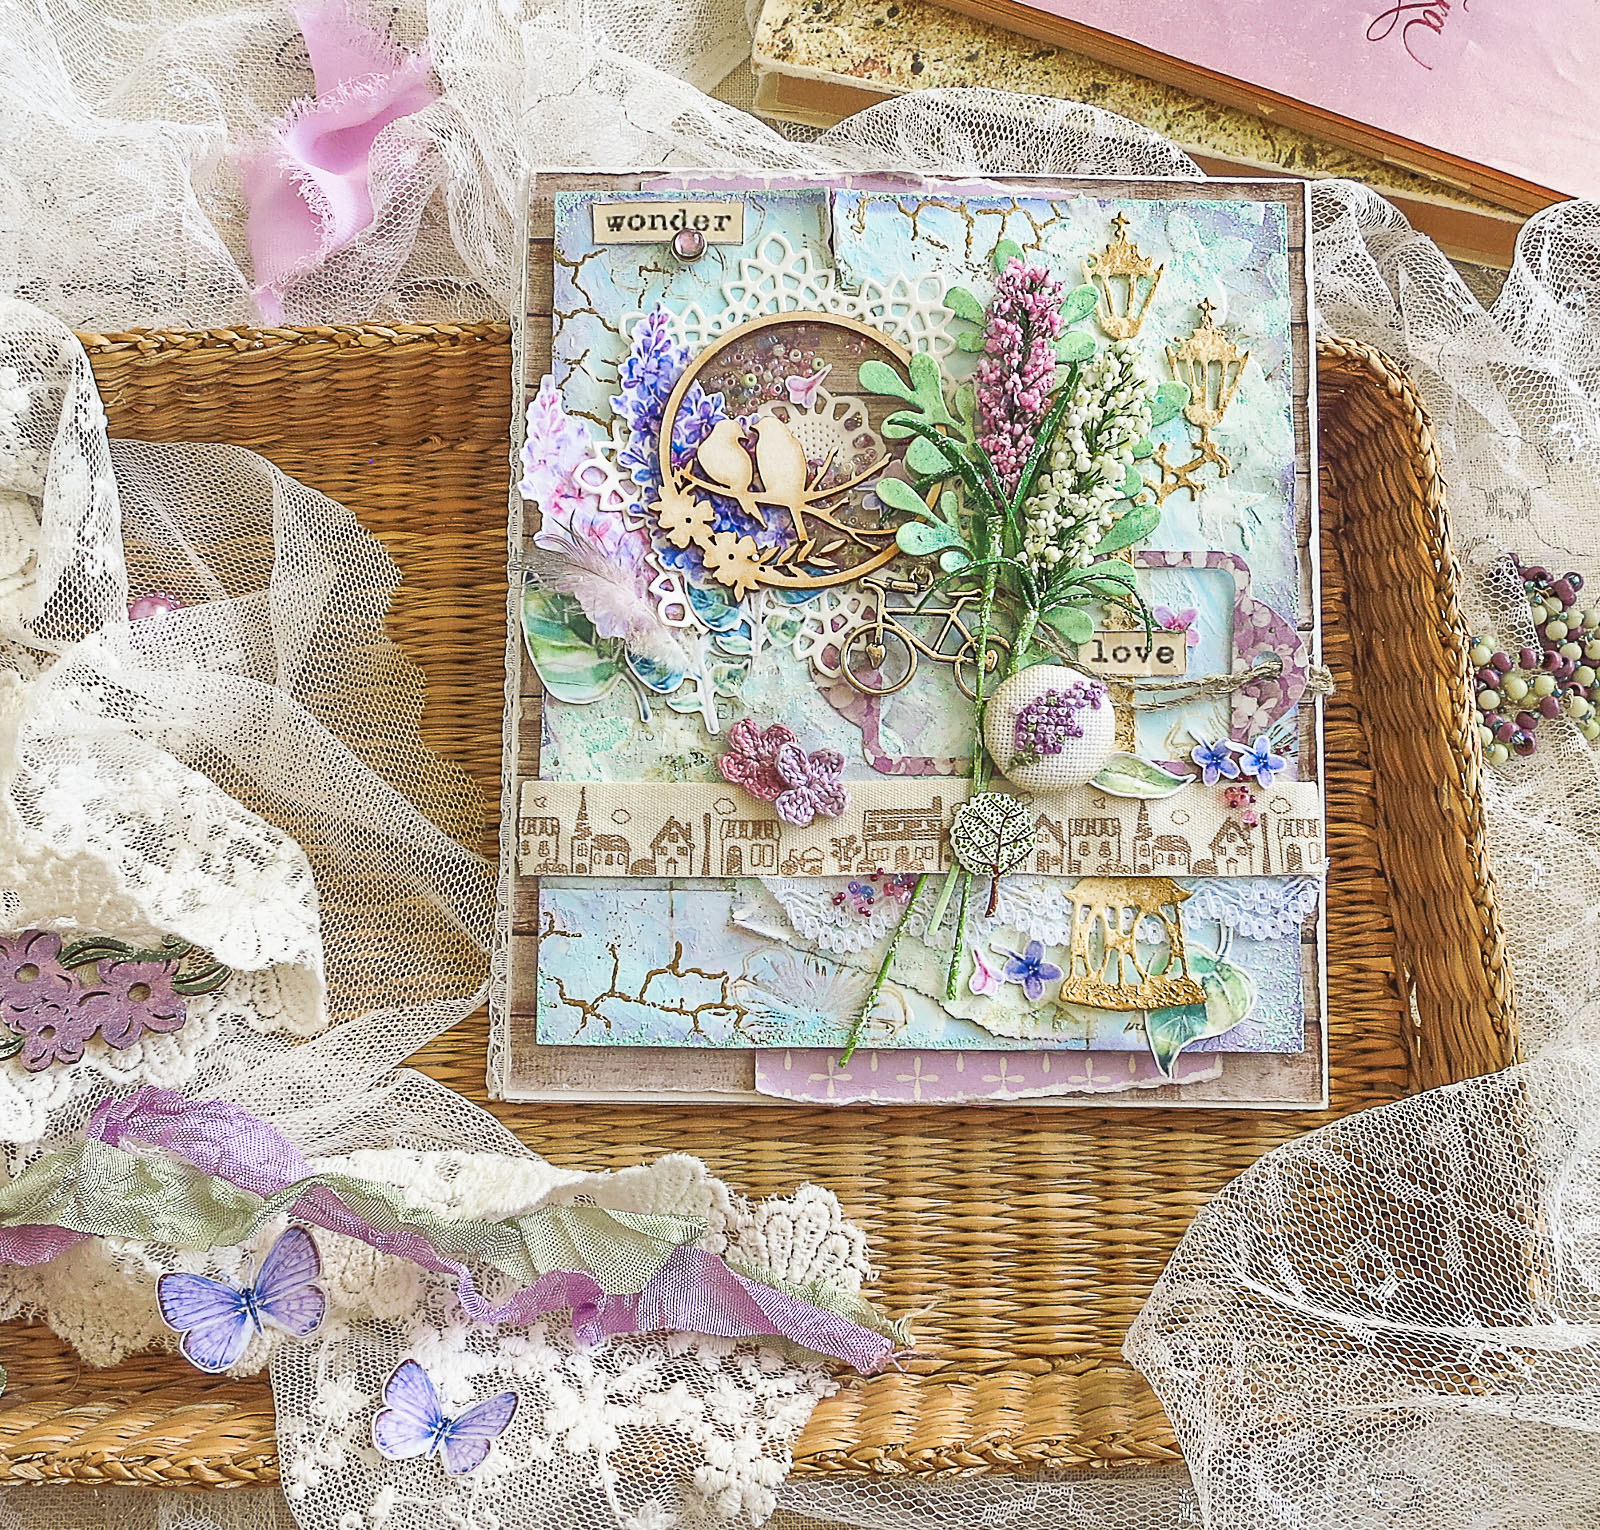 scrapbooking card, spring card, embroidery in scrapbooking, crochet flower, lilac, бузок, листівка скрапбукінг, вышивка в скрапбукинге, сирень, цветы крючком, цветы сирени, скрапбукинг открытка